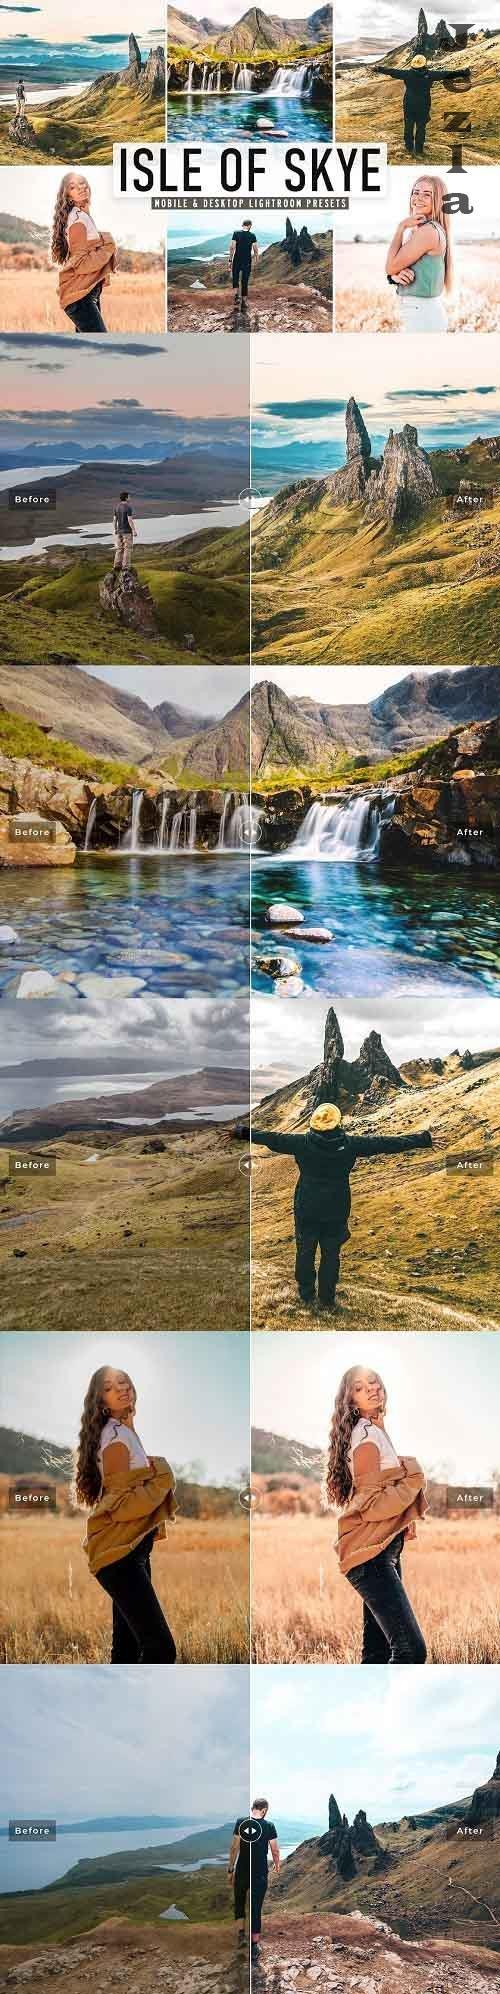 Isle of Skye Pro Lightroom Presets - 5554268 - Mobile & Desktop